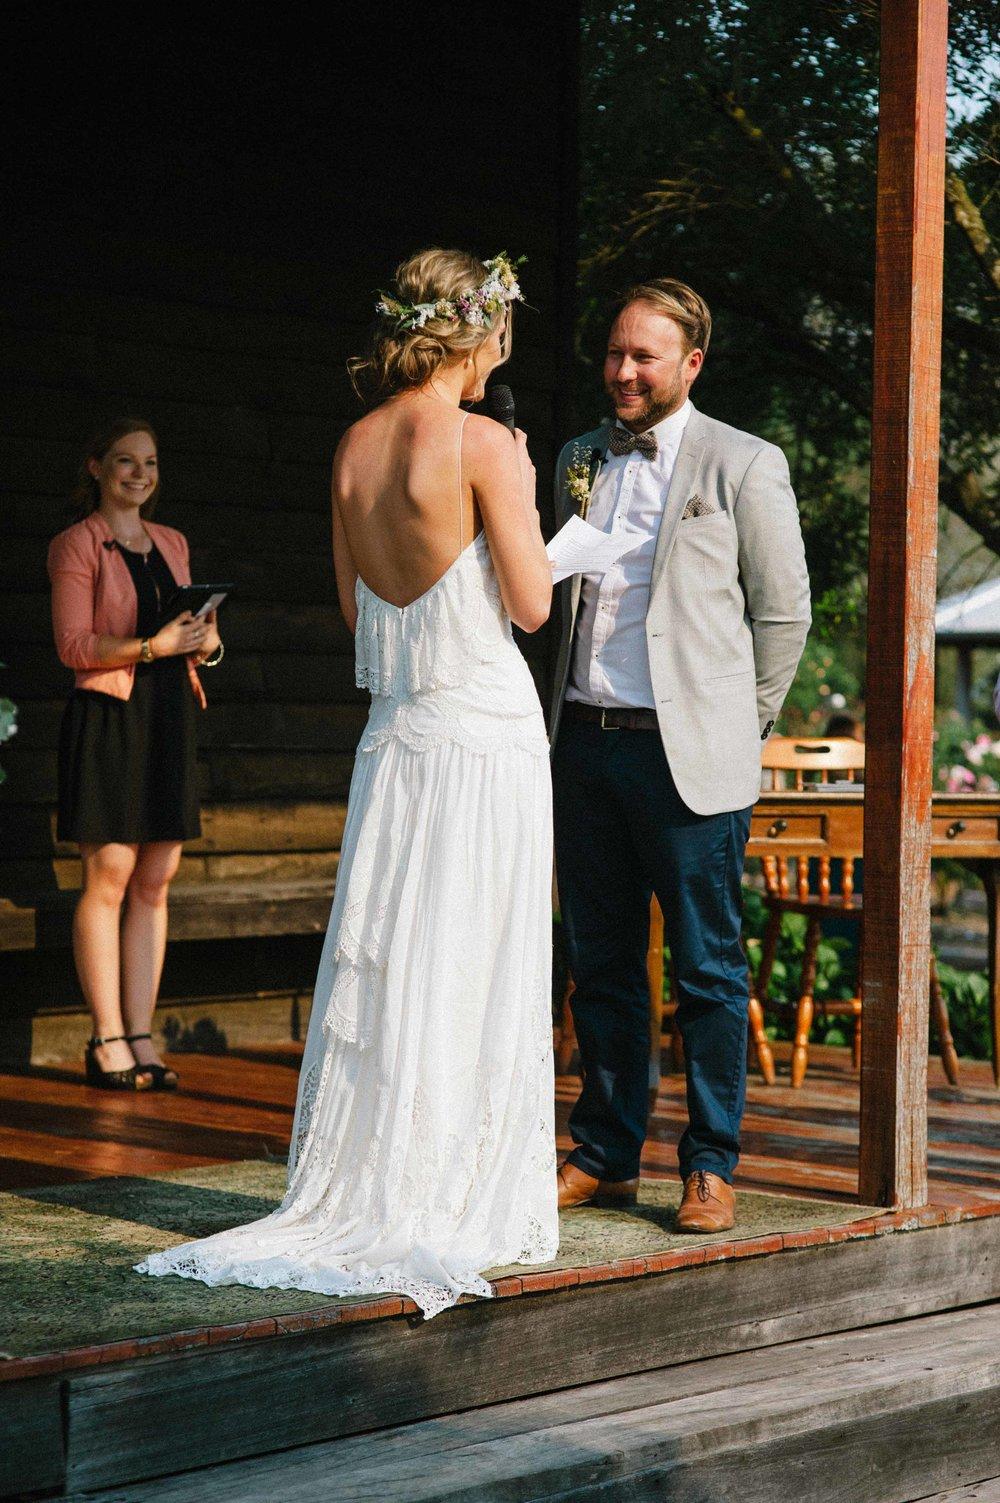 23-down south wedding perth photographer.jpg